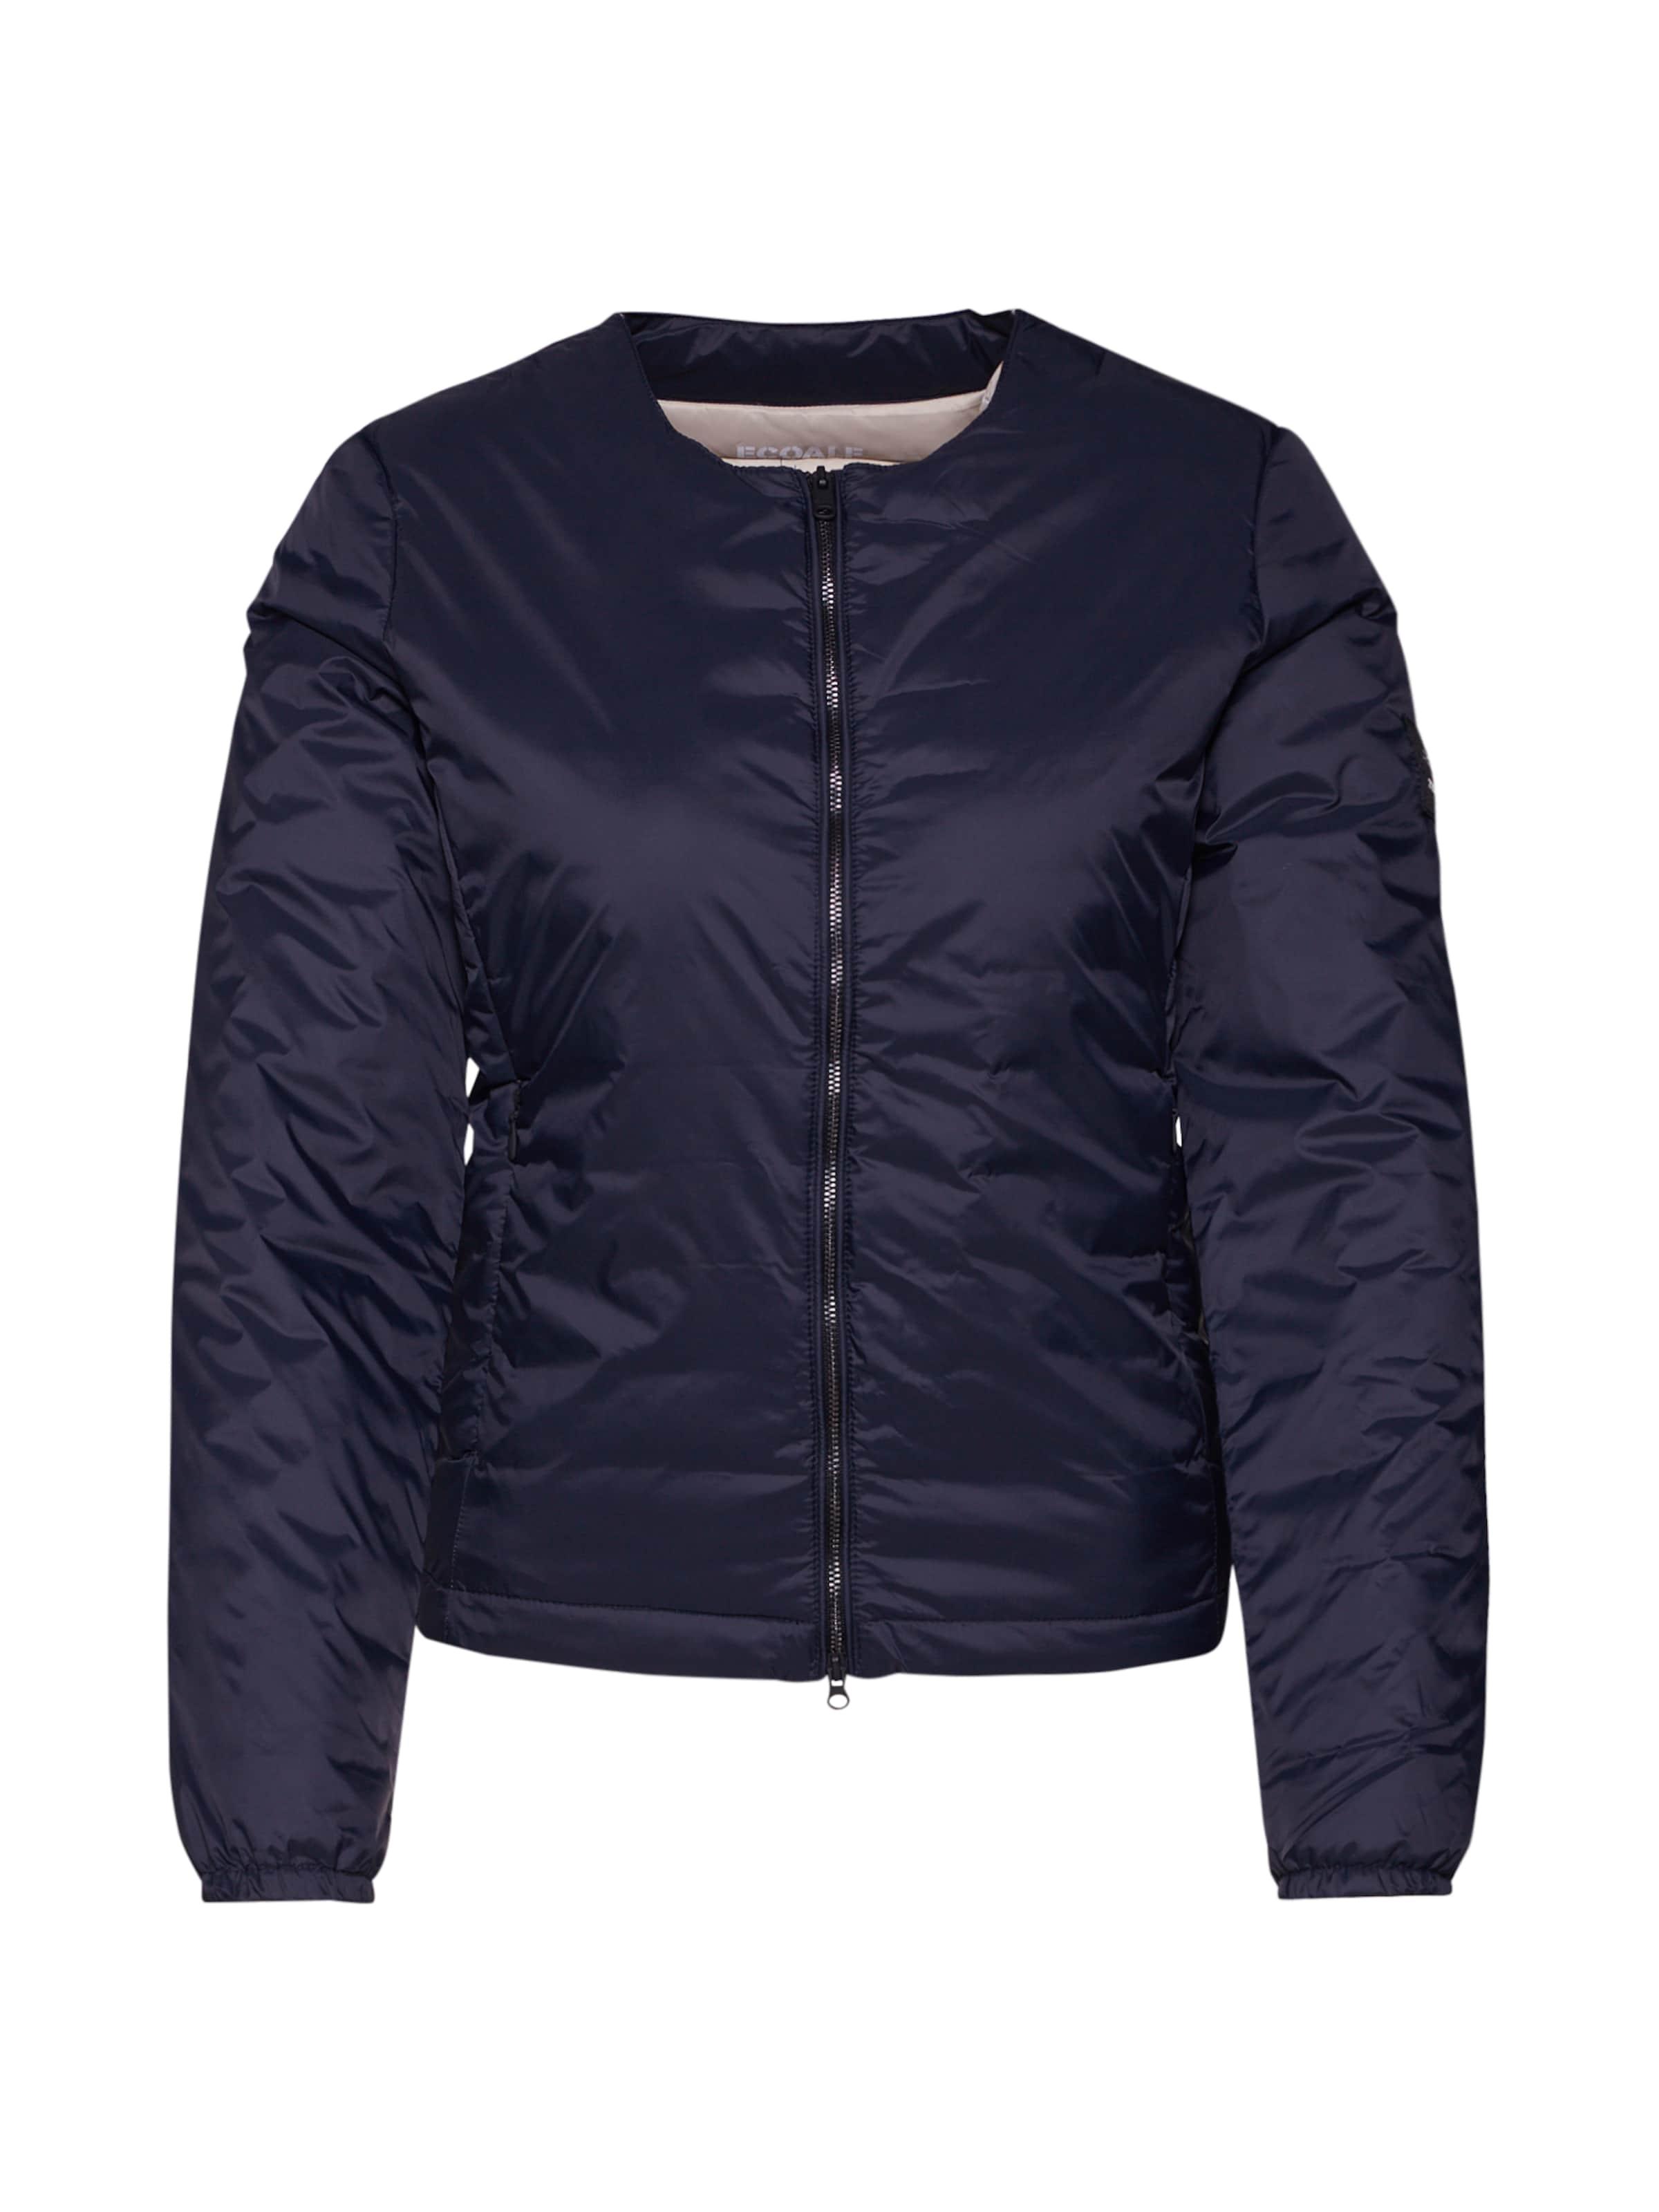 saison Marine 'nikky Bleu EcoalfVeste Mi Downjacket' In 0wOPk8NnX